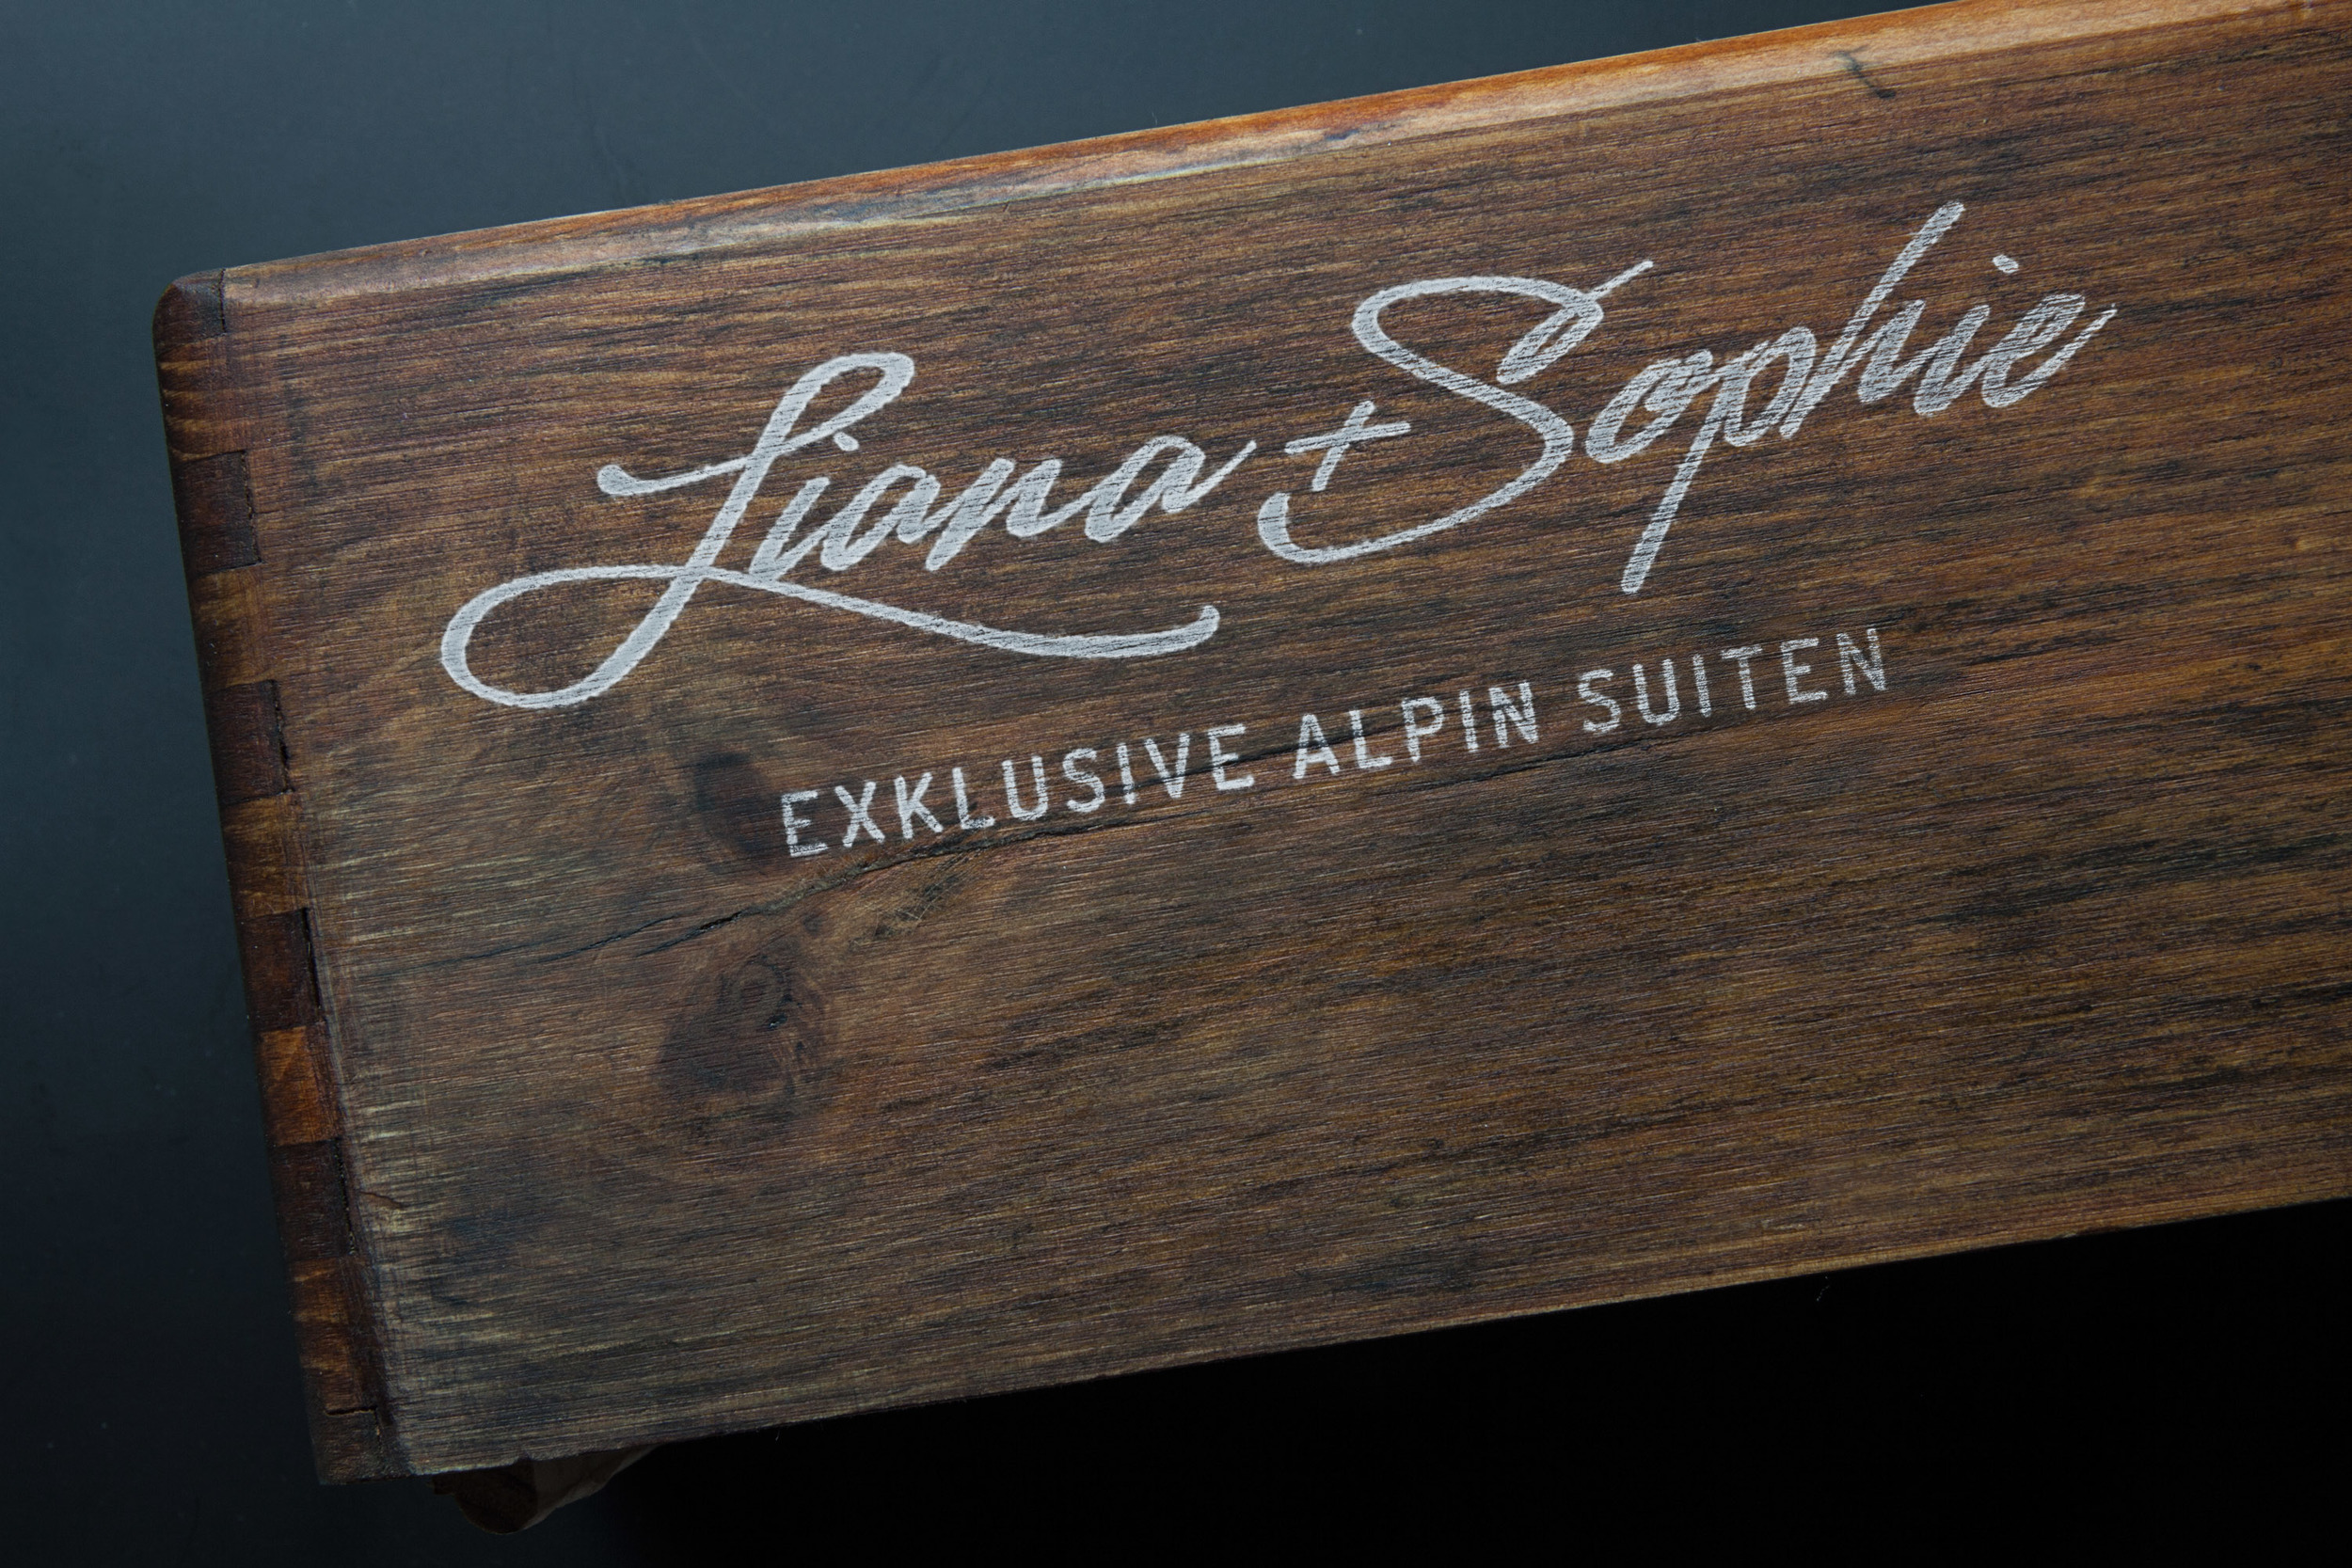 appartement-suites-liana-sophie-neukirchen-logo-woodblock